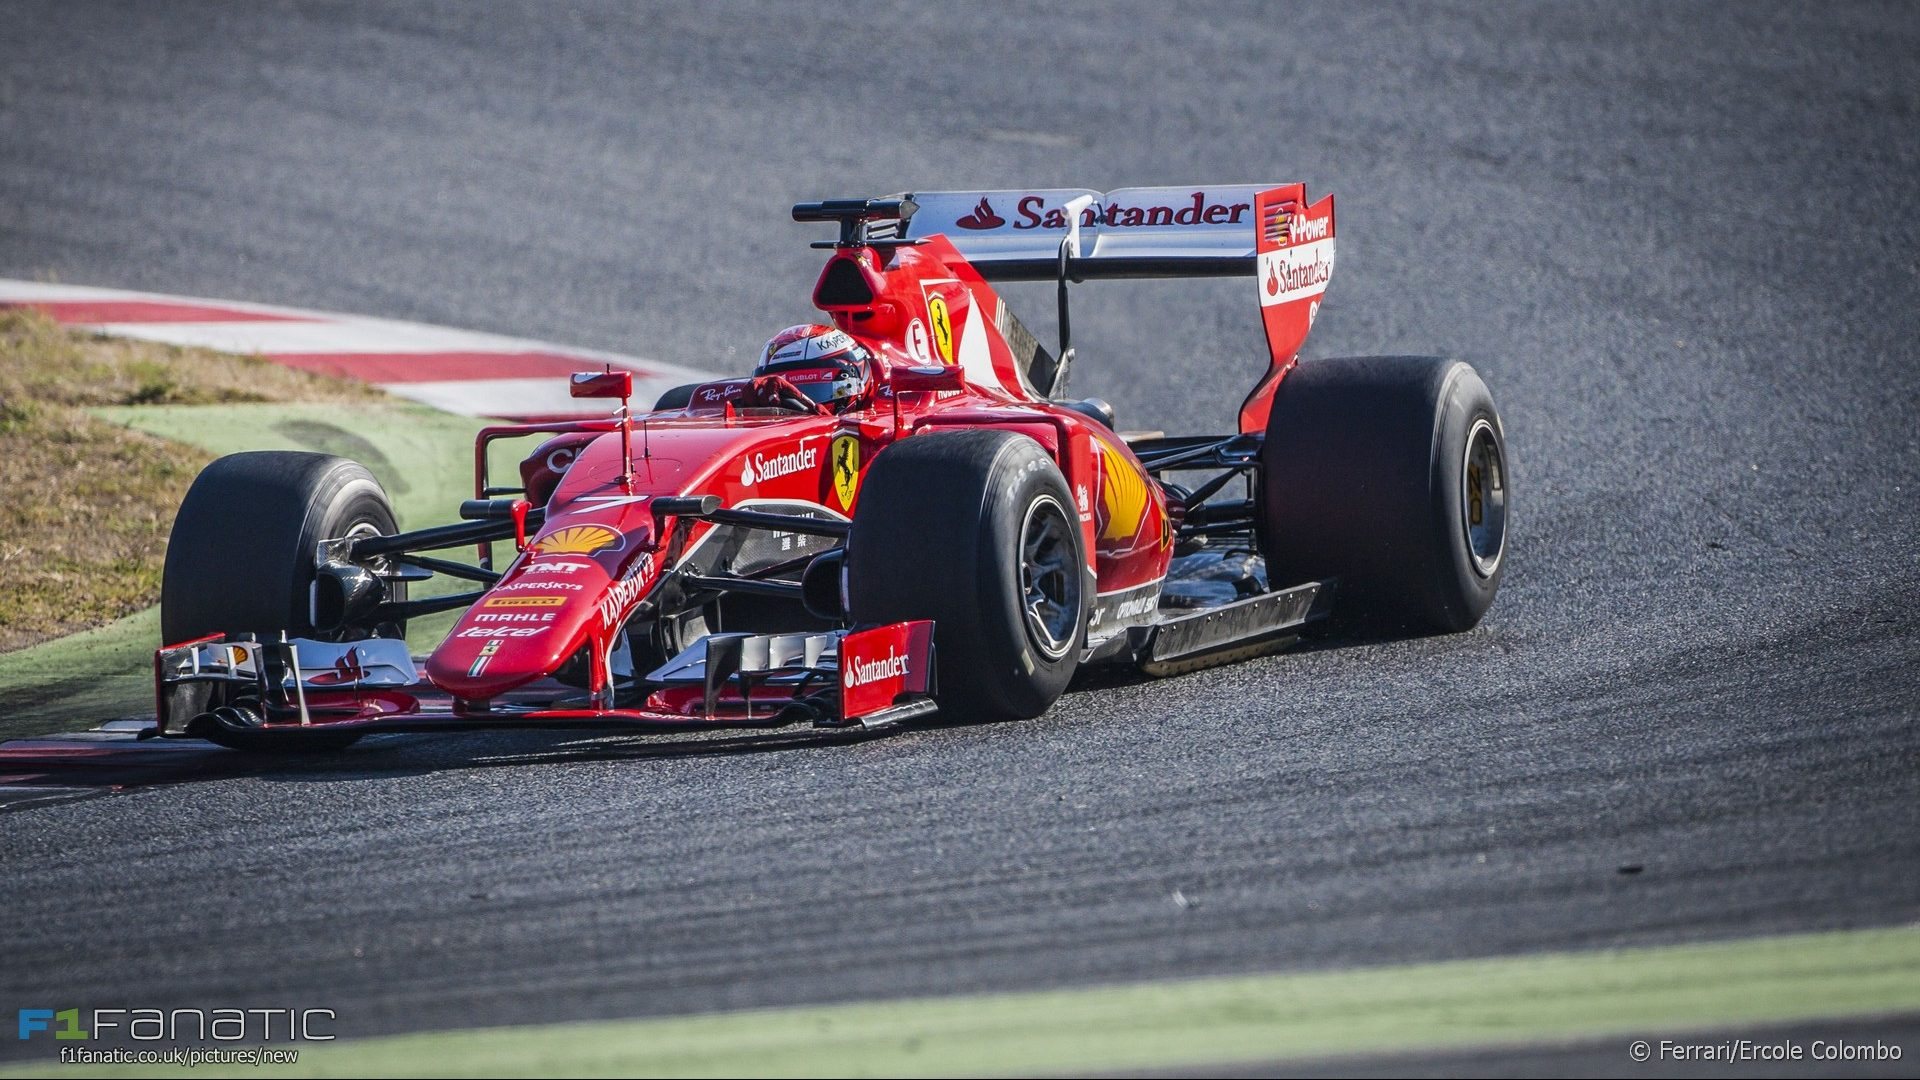 Kimi Raikkonen to leave Ferrari join Sauber in 2019